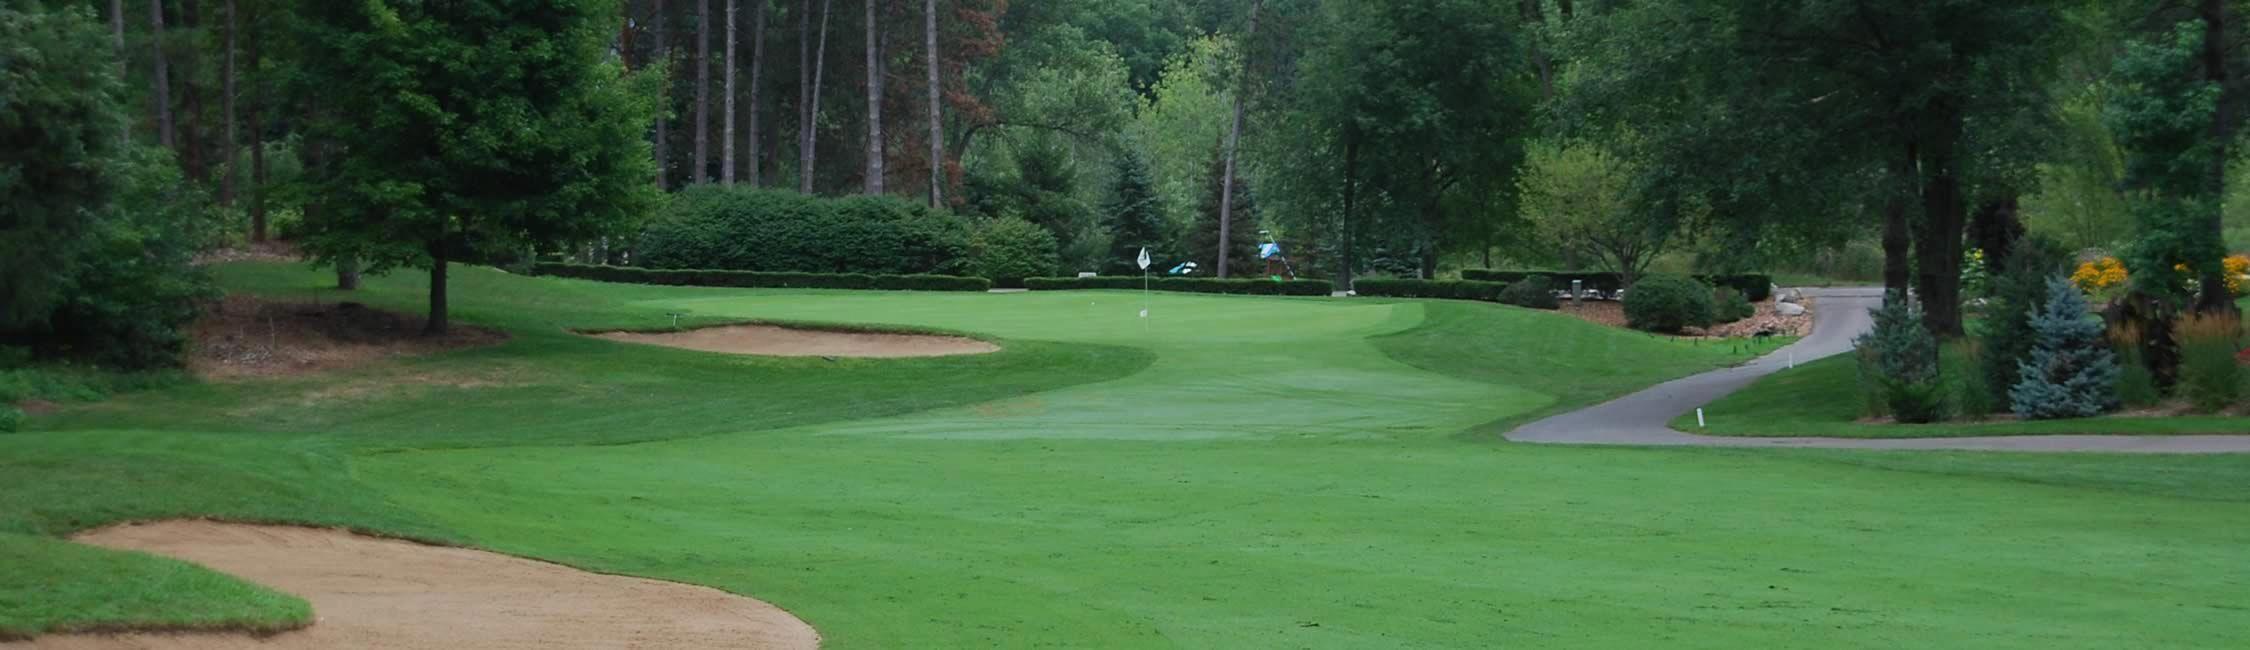 GolfPrideGrips Golf courses, Public golf courses, Golf